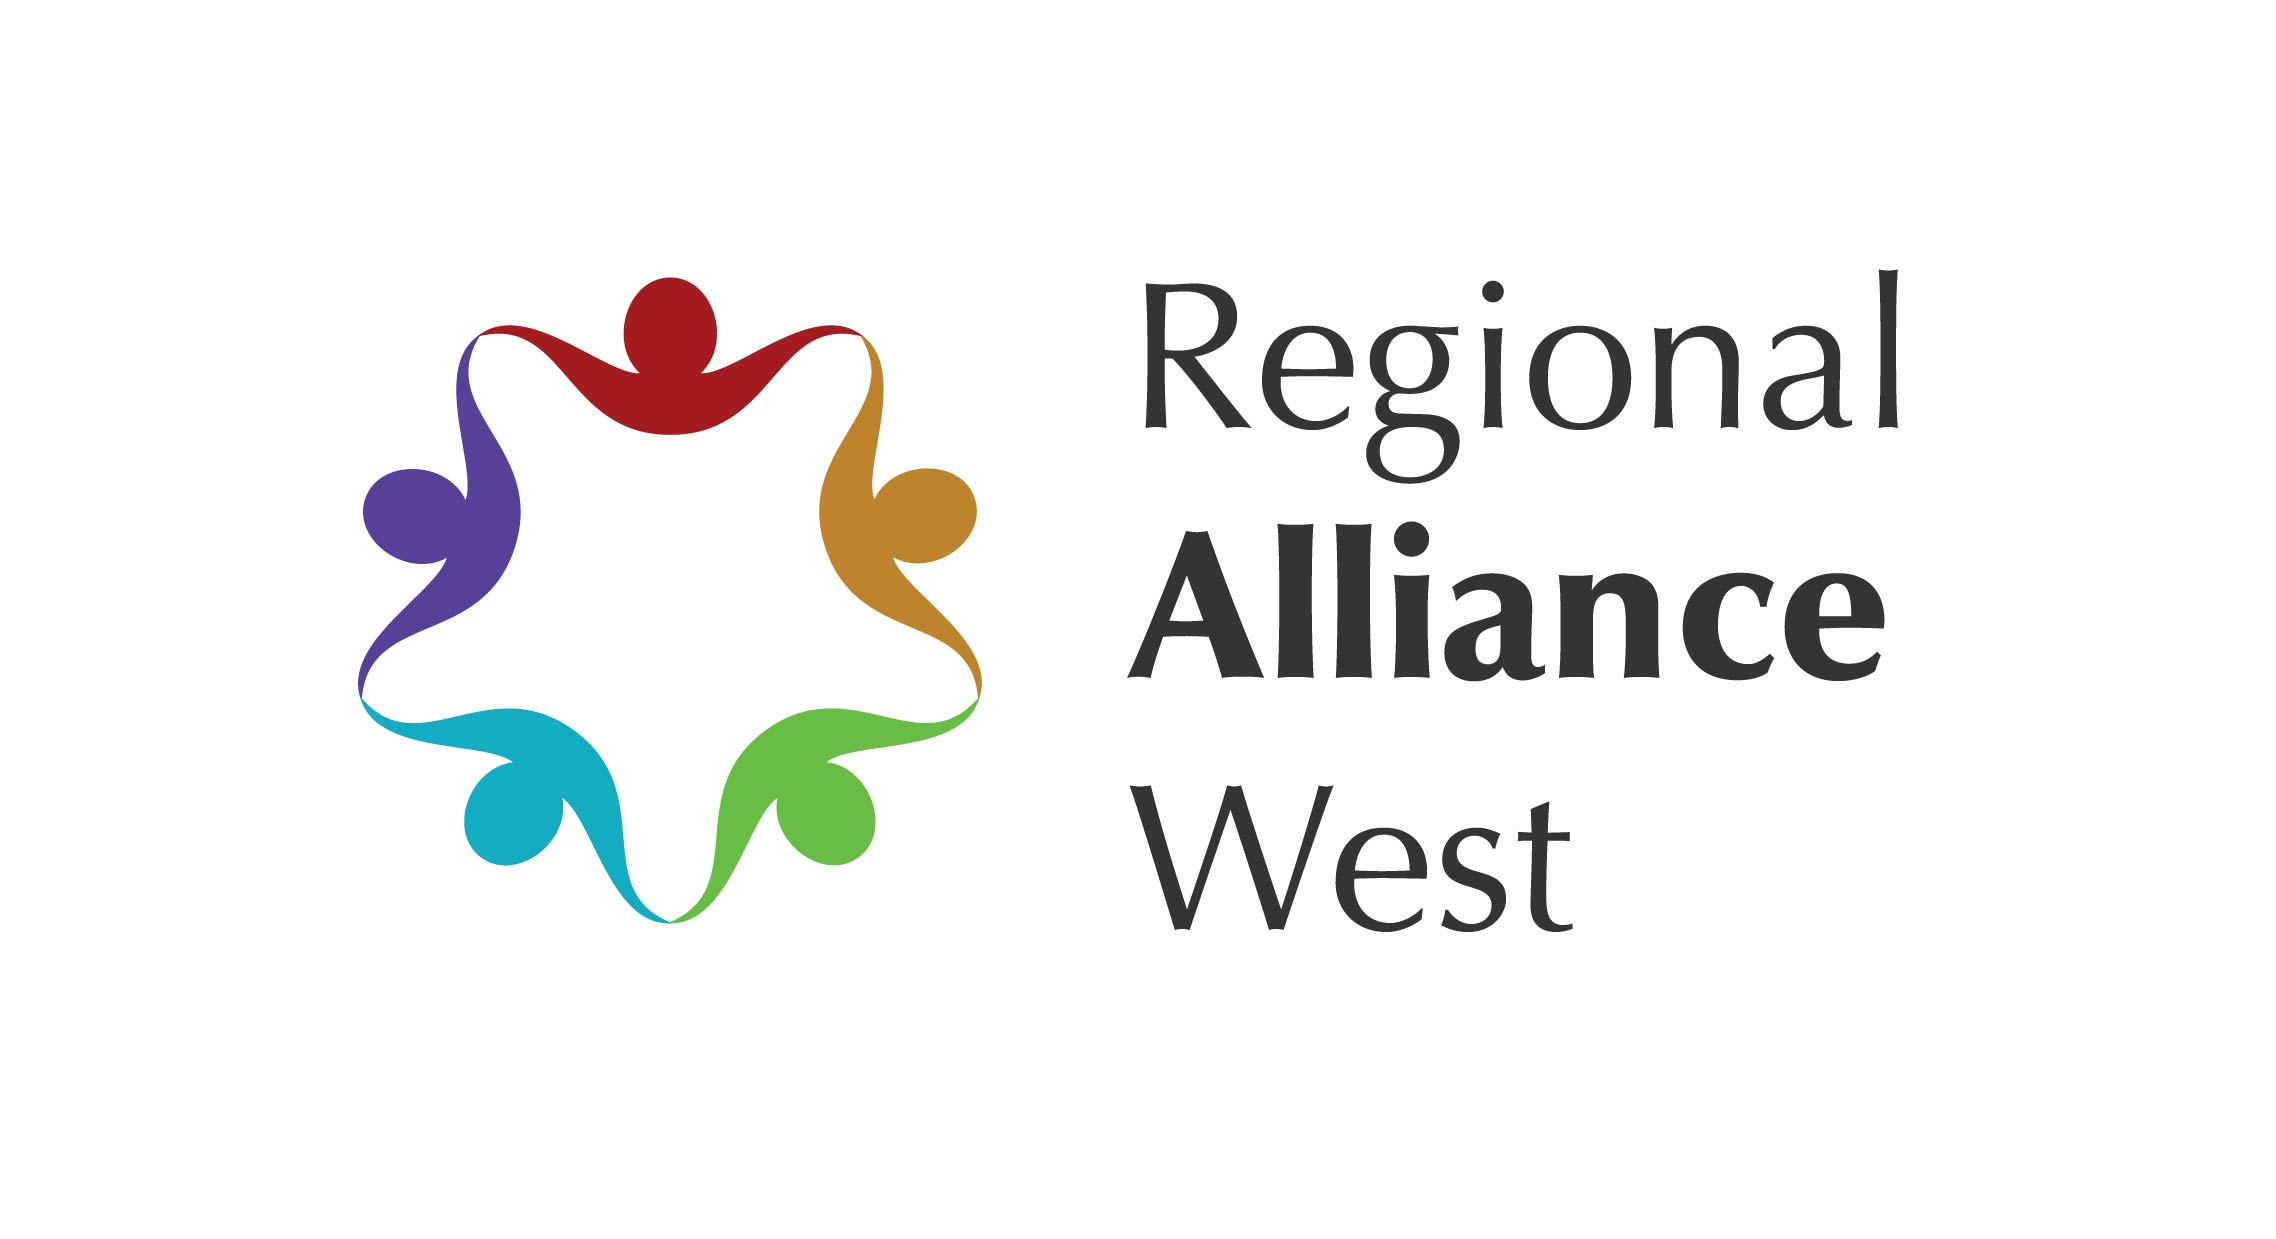 Regional Alliance West